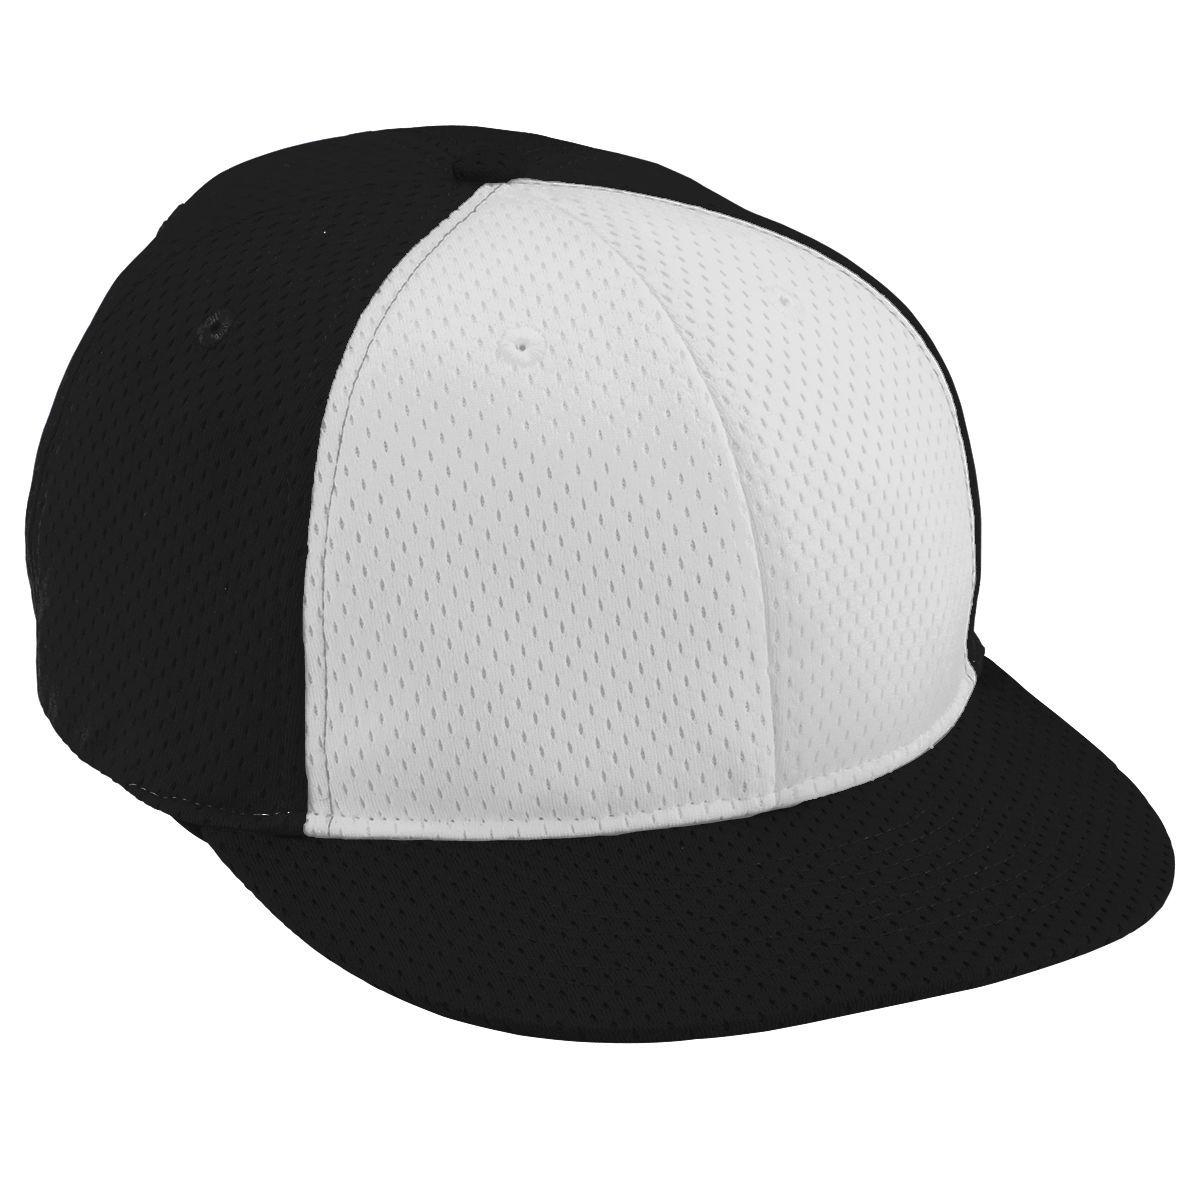 Adult Athletic Mesh Flat Bill Cap - BLACK/WHITE/BLACK